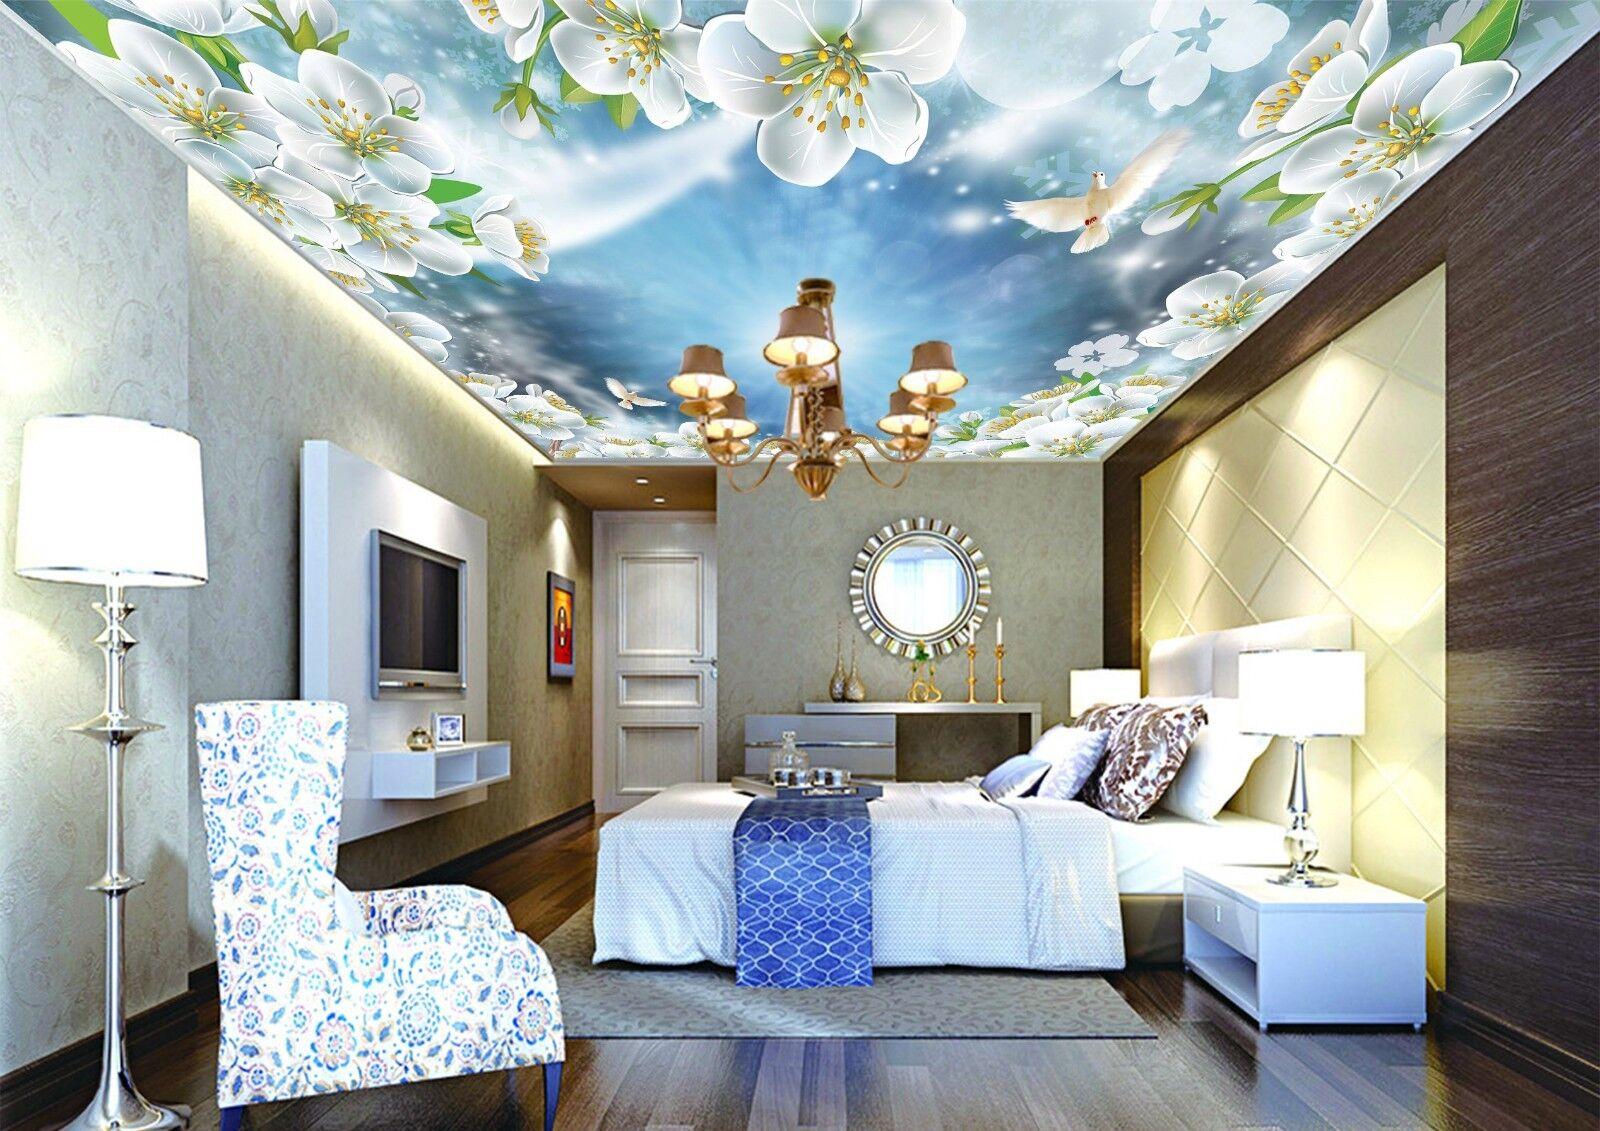 3D White Flower Dove 8 Wall Paper Wall Print Decal Wall Deco AJ WALLPAPER Summer